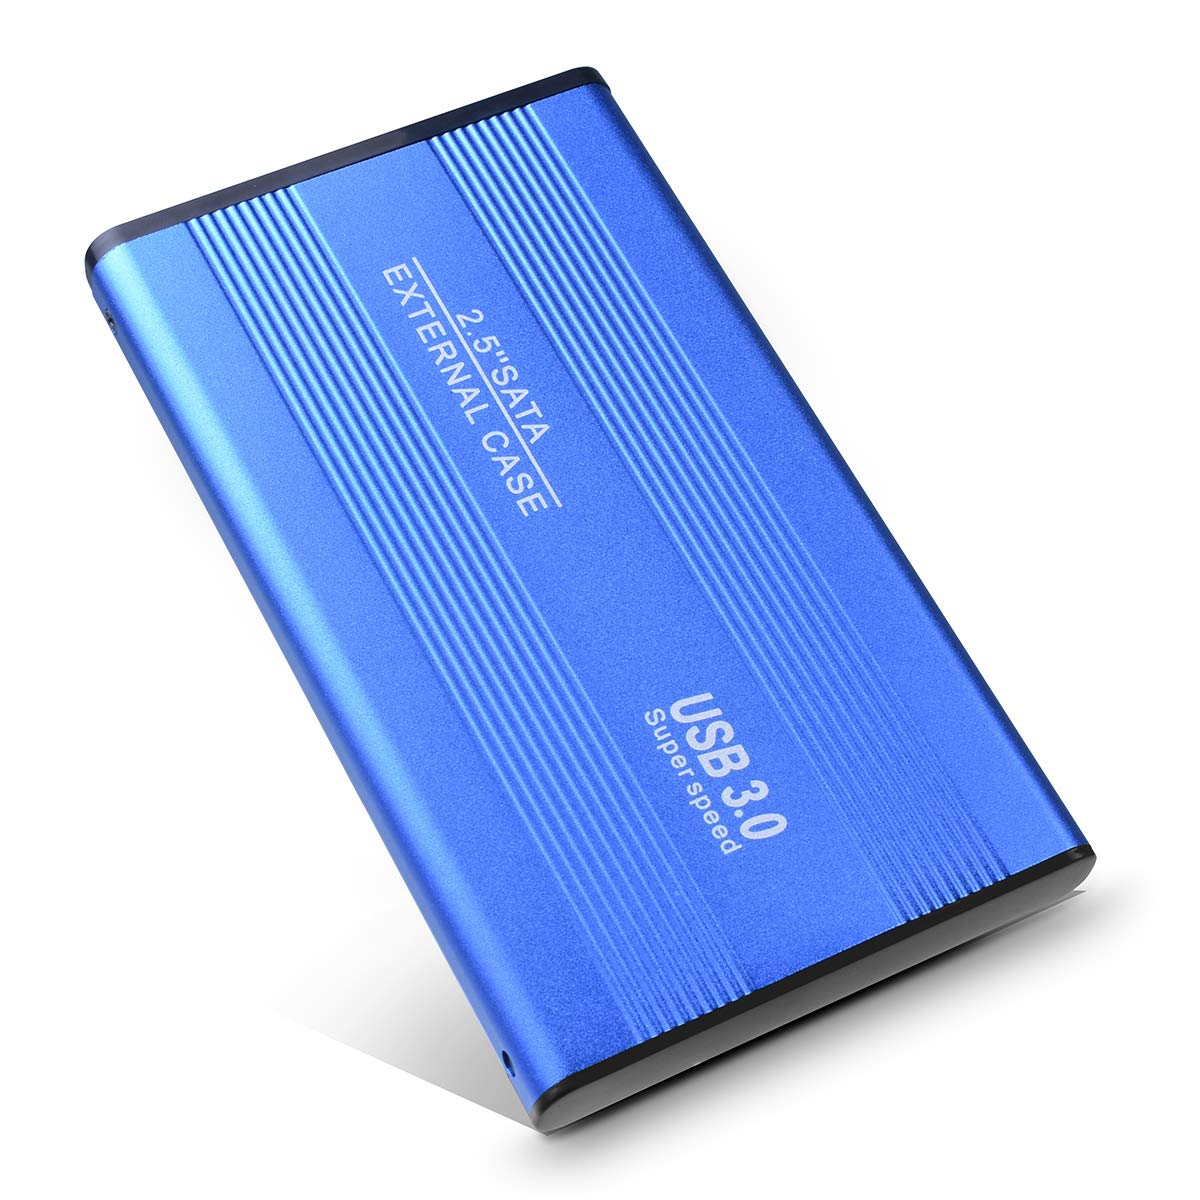 Disco Duro Externo 1 TB 1TB,Negro MacBook Disco Duro Externo USB3.0 para PC PS4 Mac,Xbox Chromebook